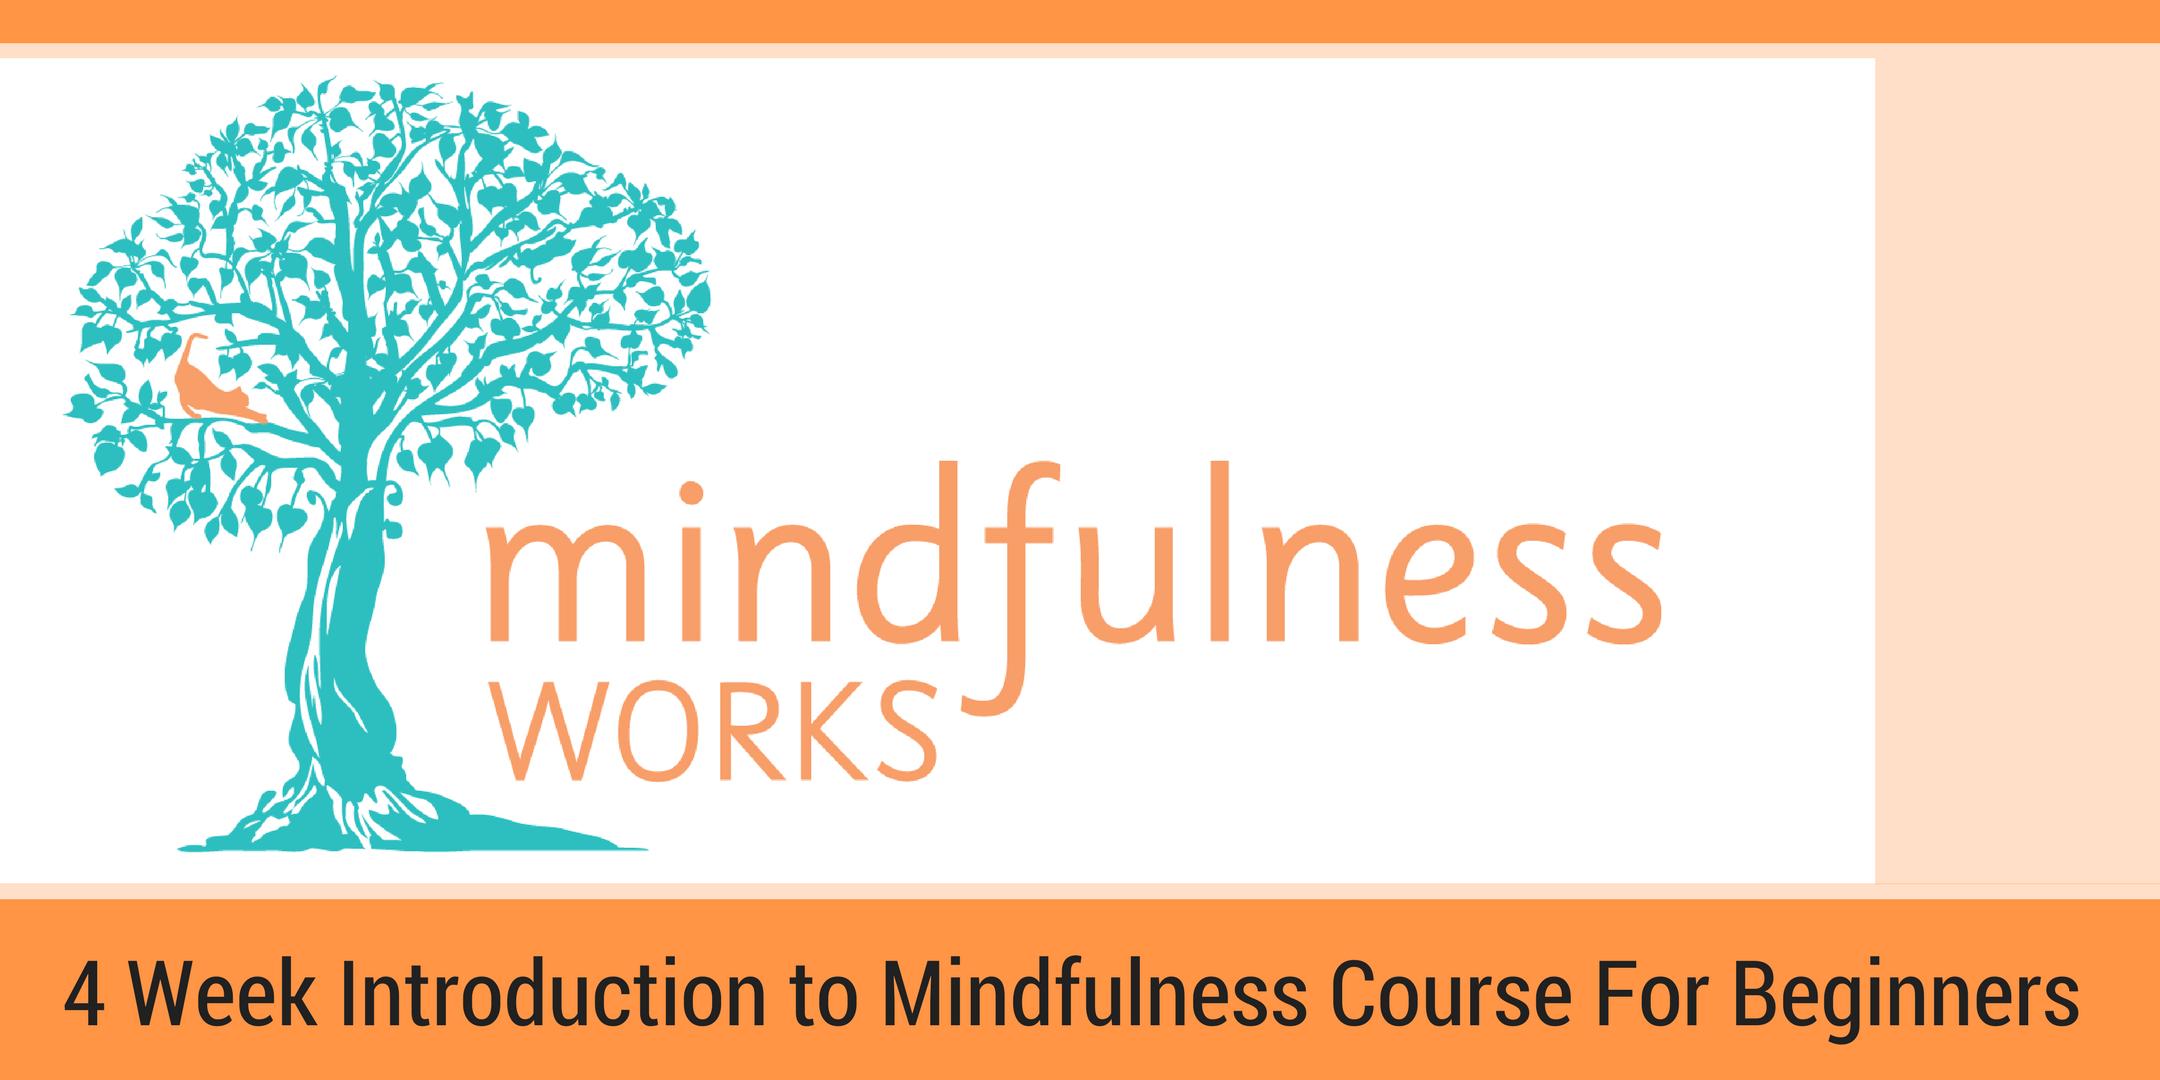 Maitland (East Maitland) – An Introduction to Mindfulness & Meditation 4 Week Course